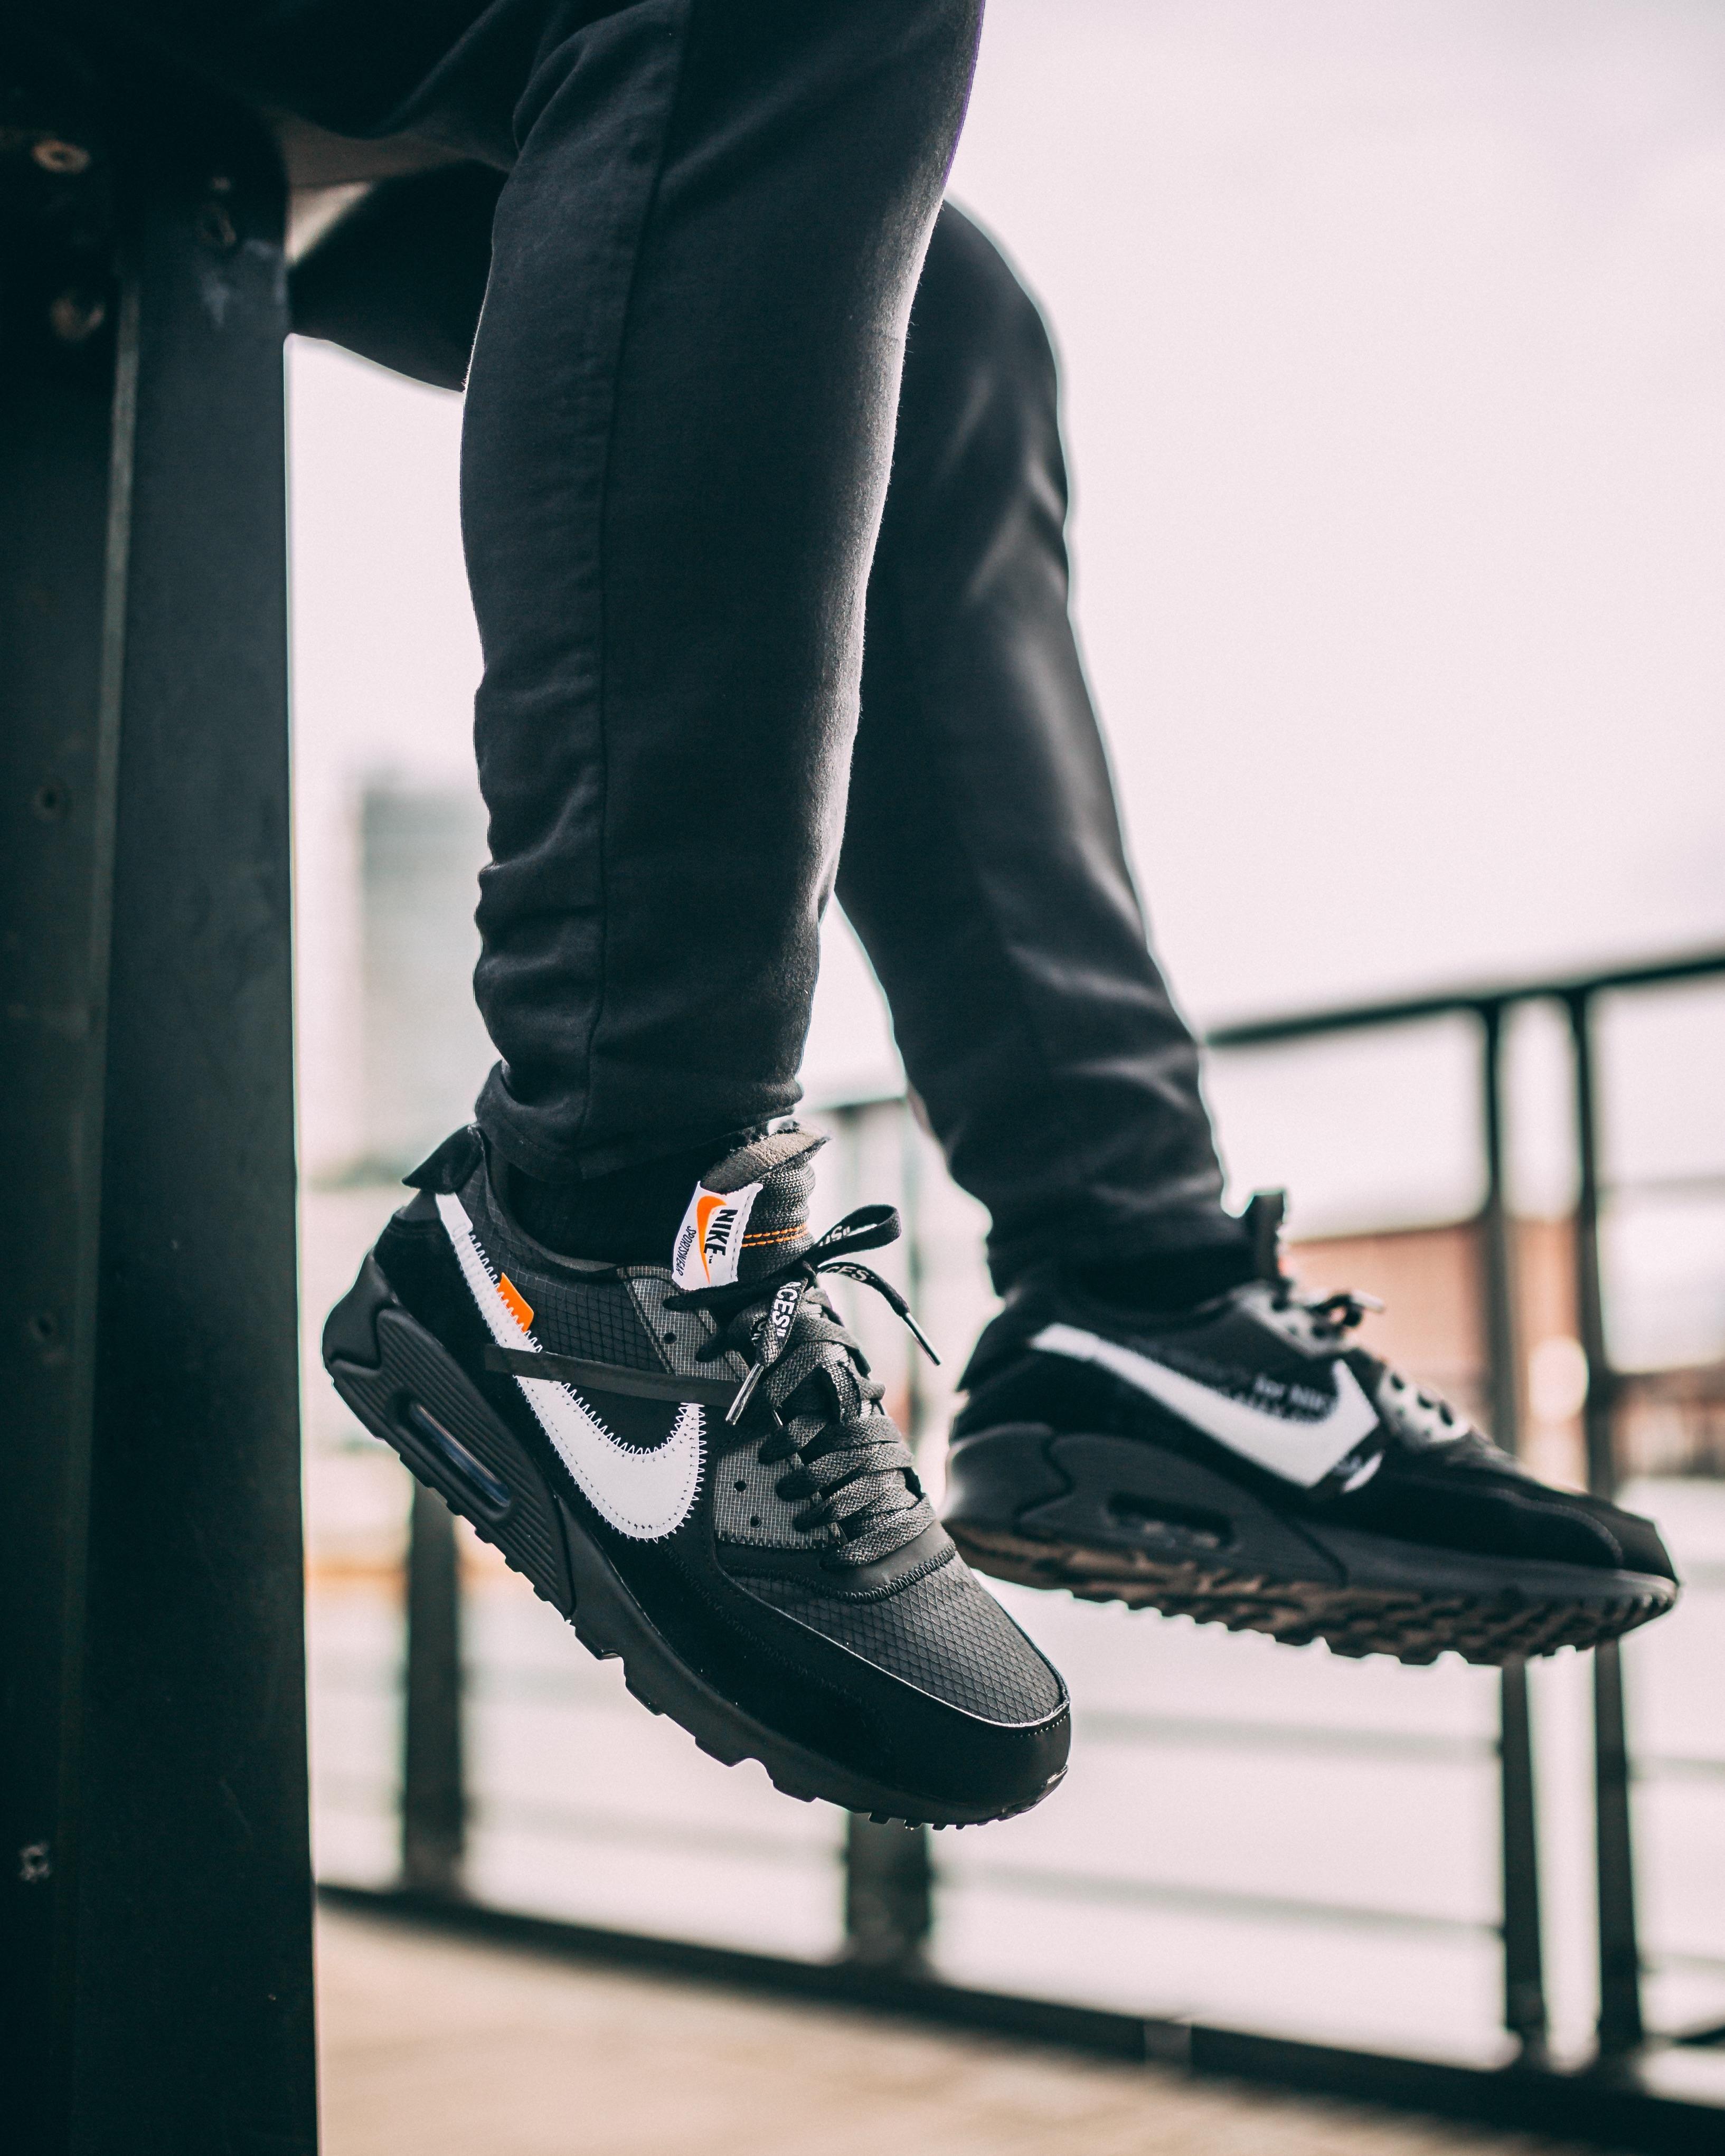 huge selection of e33c7 2a8a1 Pin by Derek Caperton on Footwear in 2019 | Sneakers nike ...